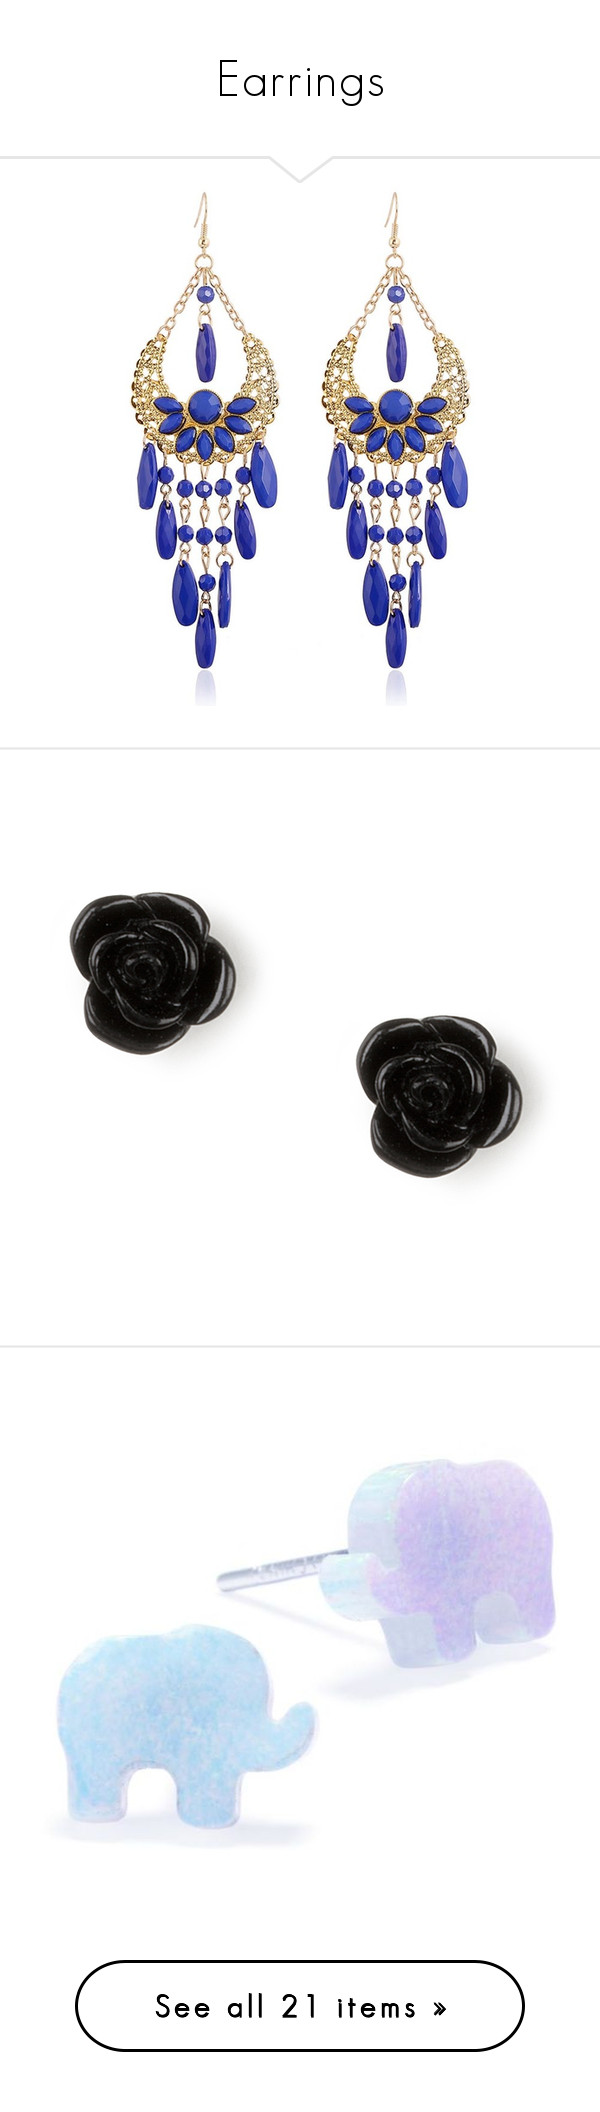 """Earrings"" by tofumint ❤ liked on Polyvore featuring jewelry, earrings, blue, flower pendant, tassle earrings, bohemian earrings, long chandelier earrings, fake earrings, rose stud earrings and rose jewellery"